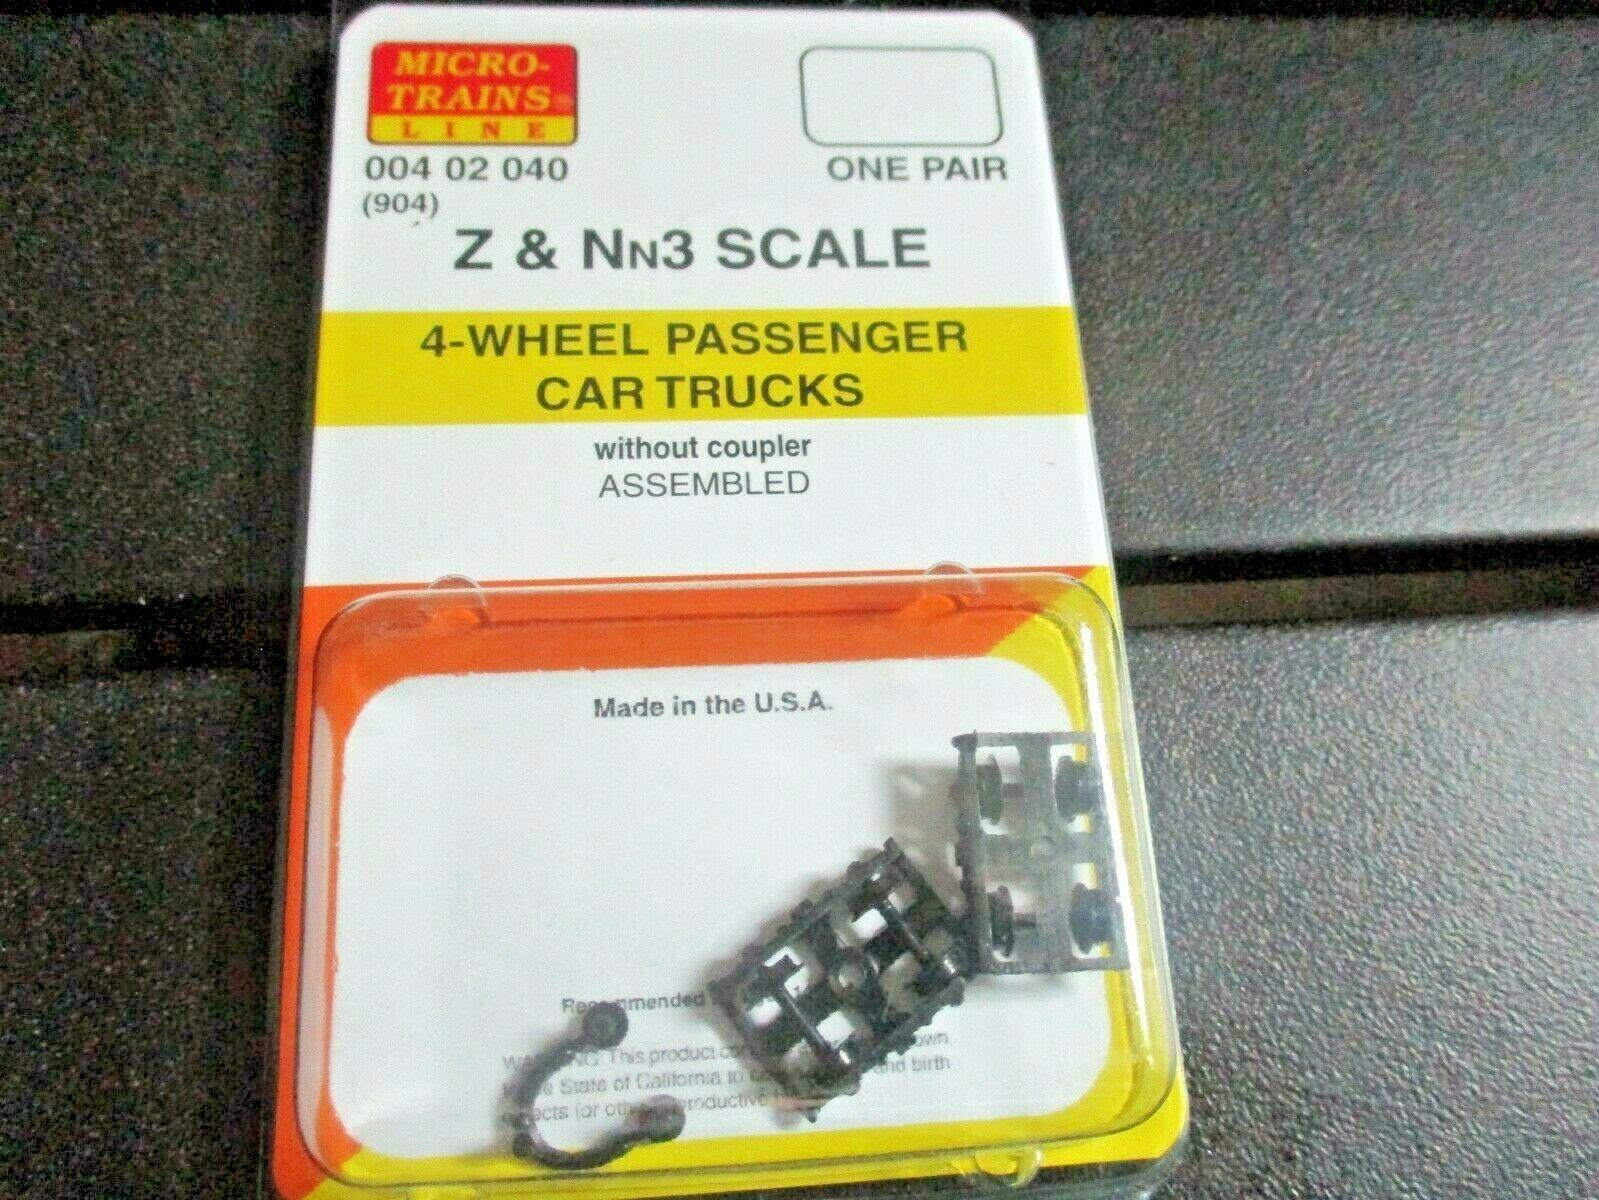 Micro-Trains Stock # 00402040 (904) 4-wheel Passenger Car Trucks Z & Nn3